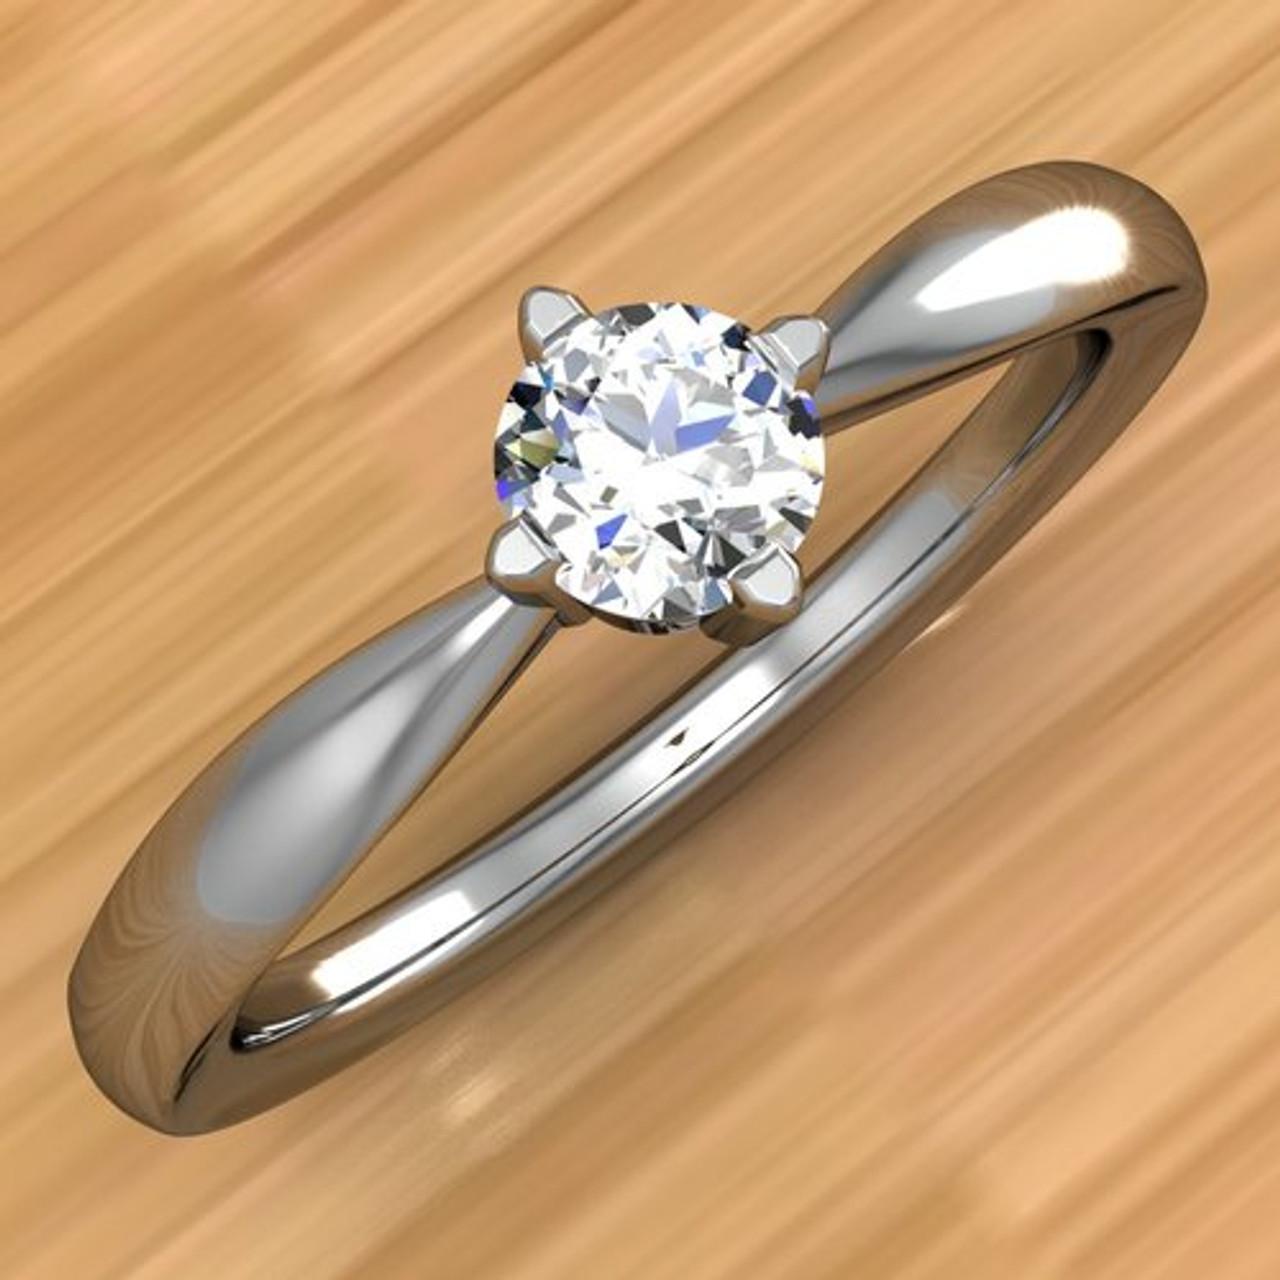 Affordable Diamond Engagement Ring 20 Carat Round Brilliant